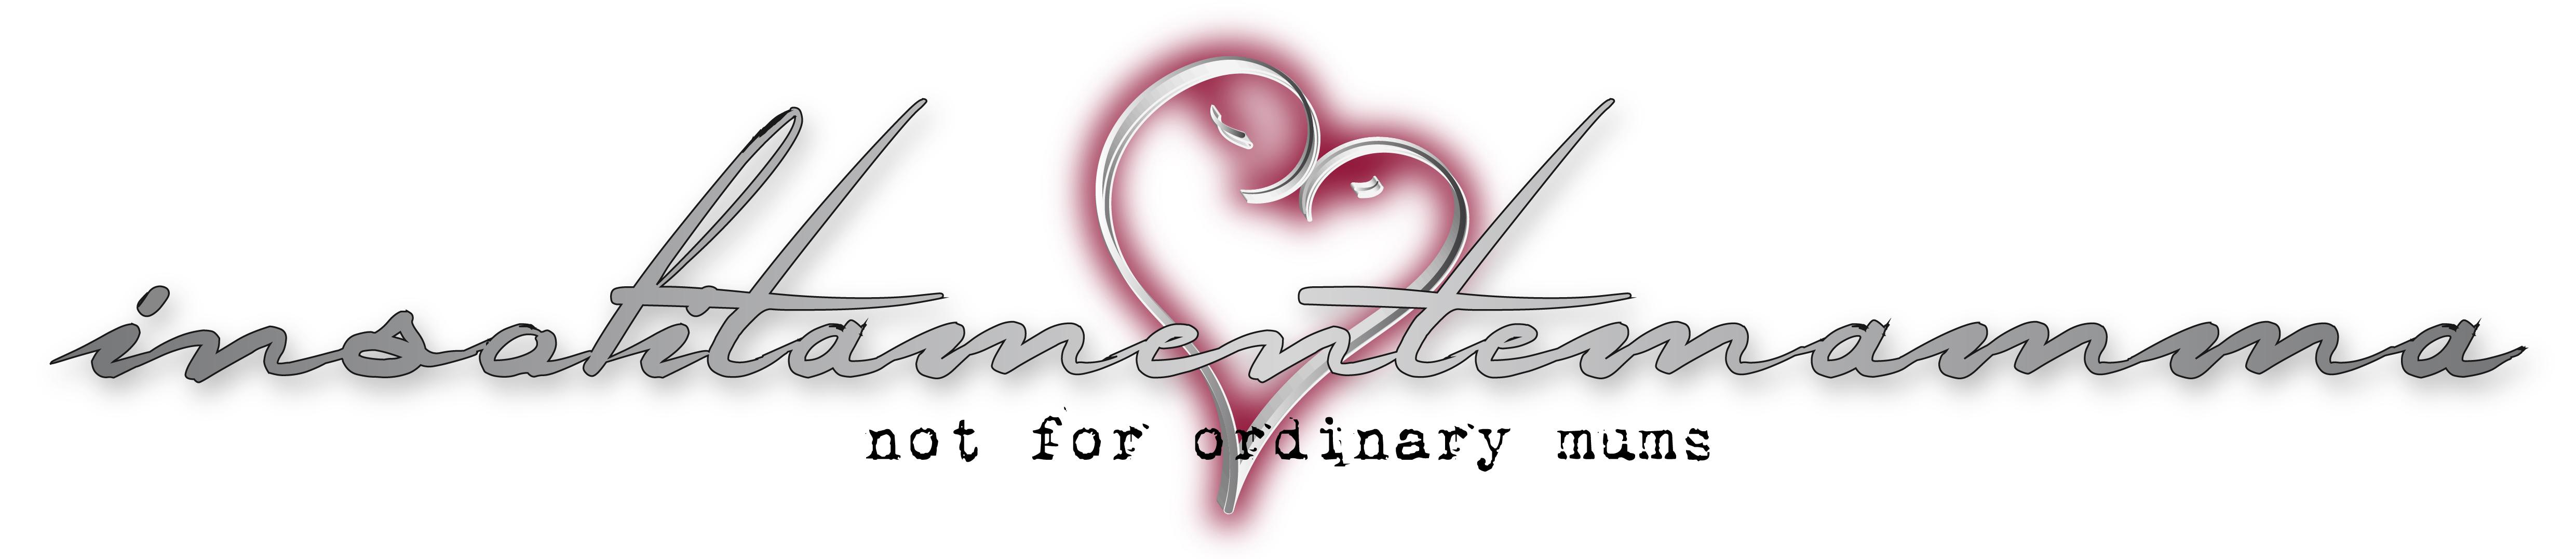 insolitamentemamma - not for ordinary mums